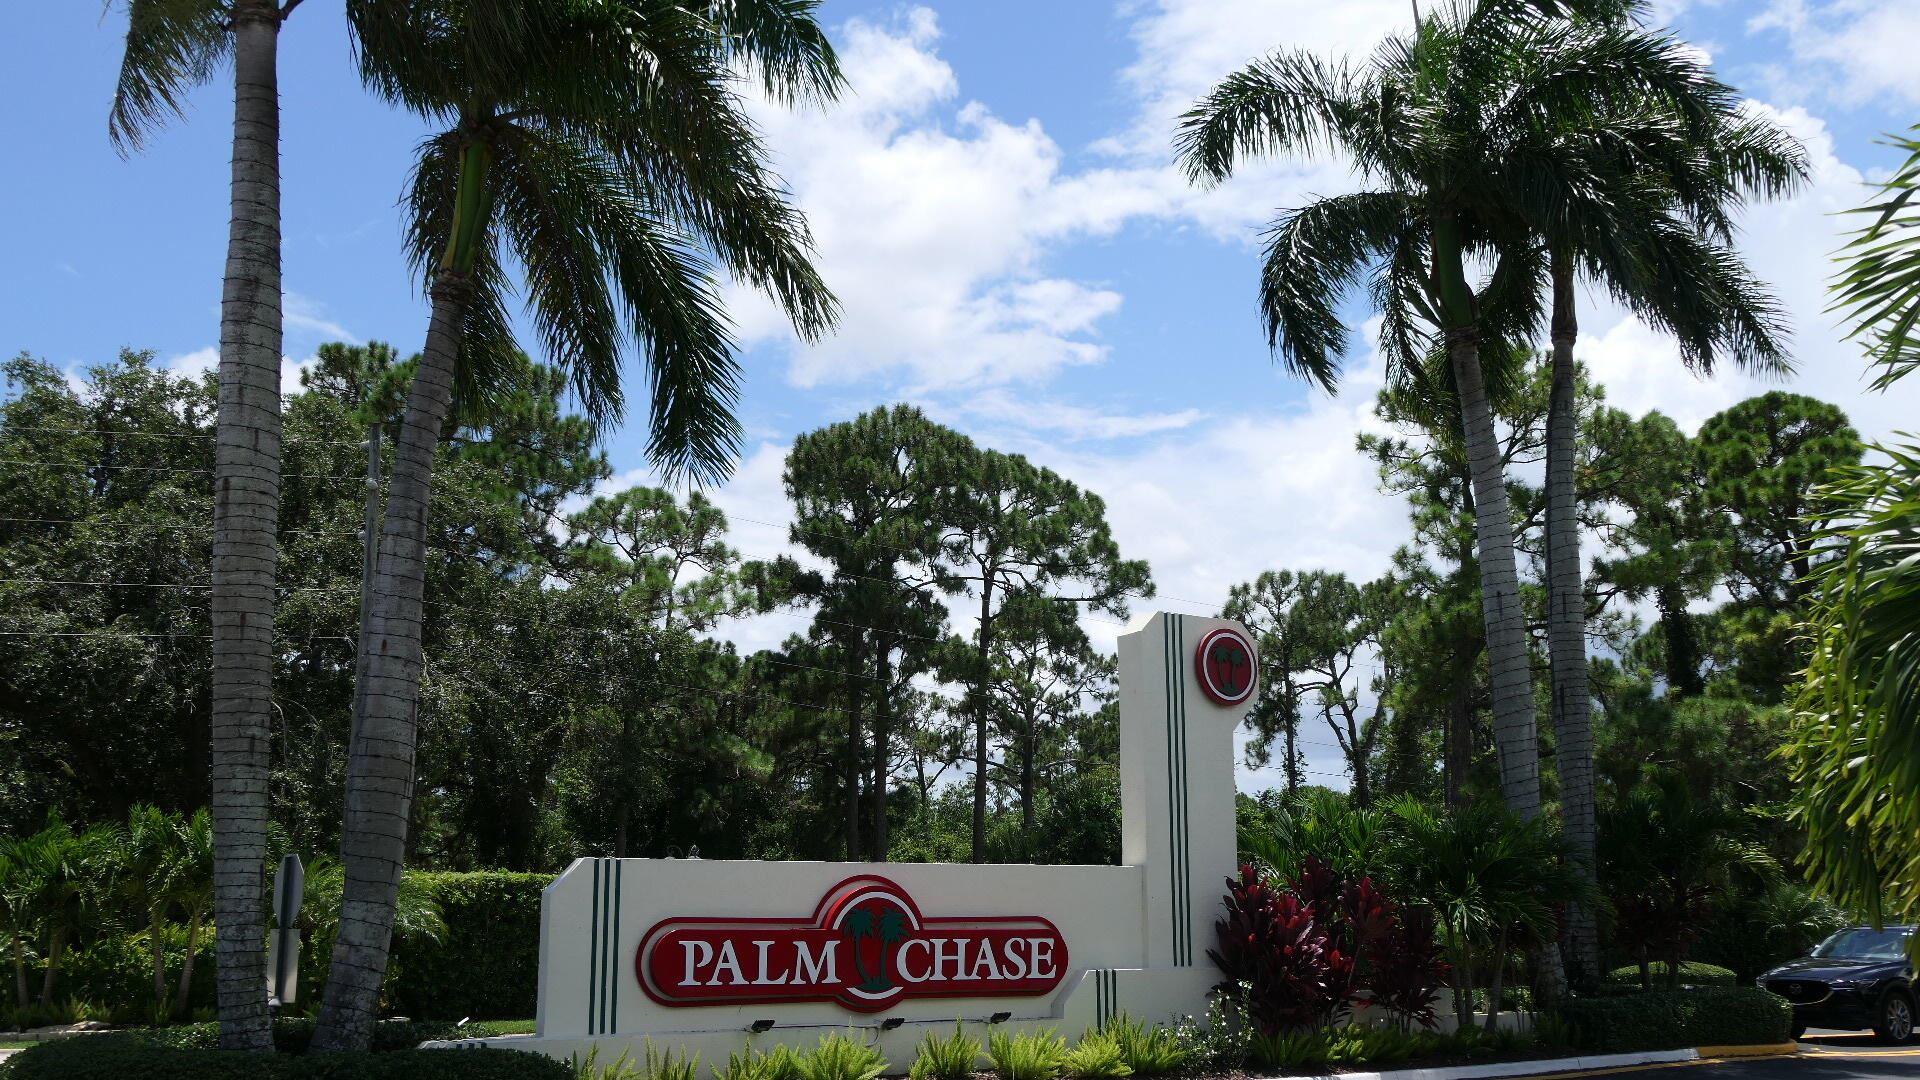 10977 Washingtonia Palm Court #B, Boynton Beach, FL 33437 - #: RX-10751092